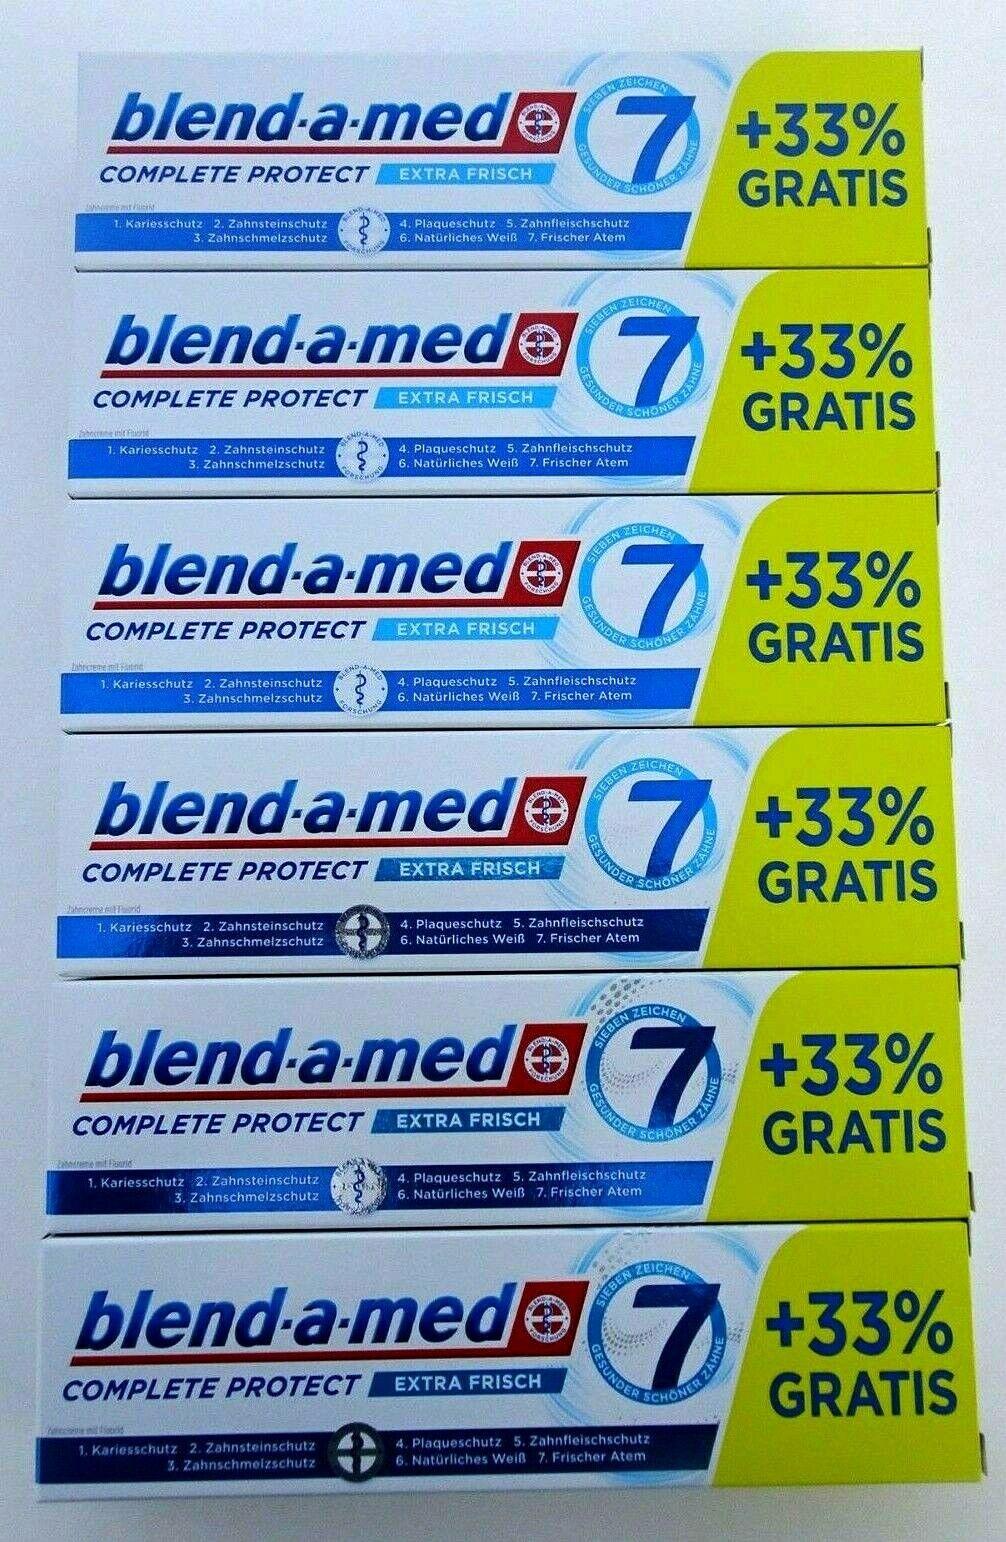 6x Blend-a-med Complete Protect 7 Zahncreme Zahnpasta Extra Frisch 6x 100ml